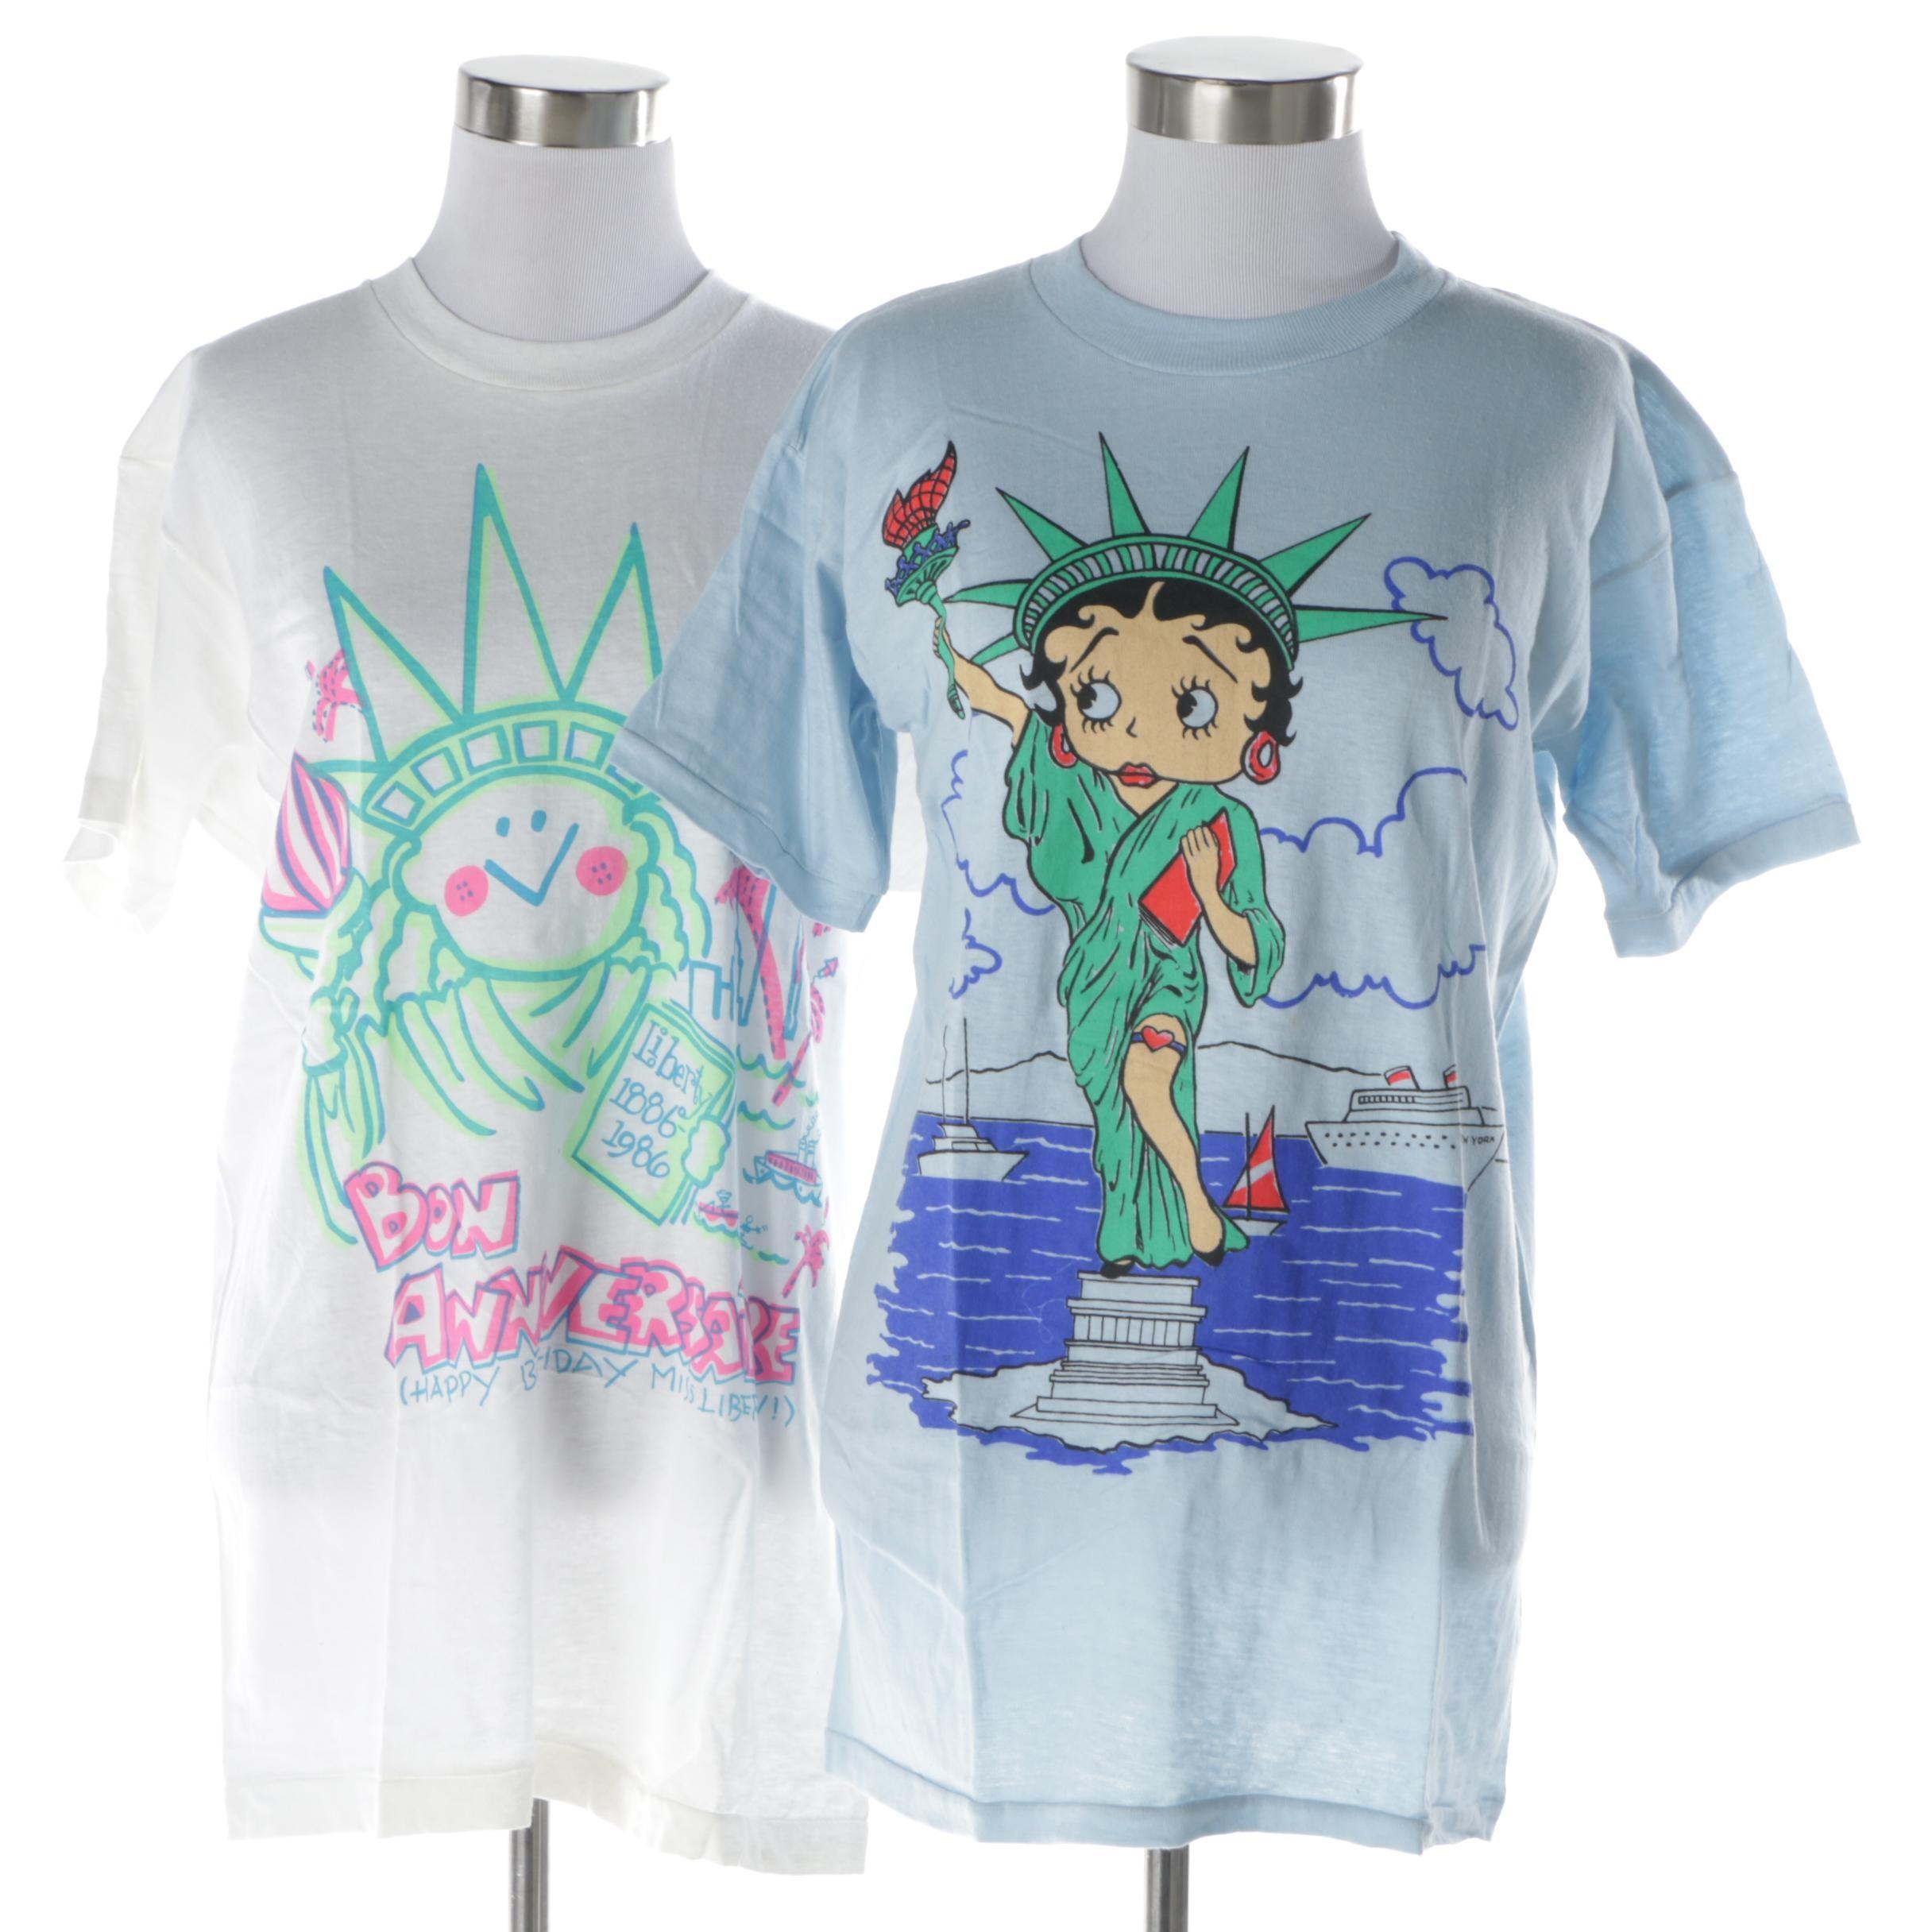 Women's Vintage Lady Liberty T-Shirts